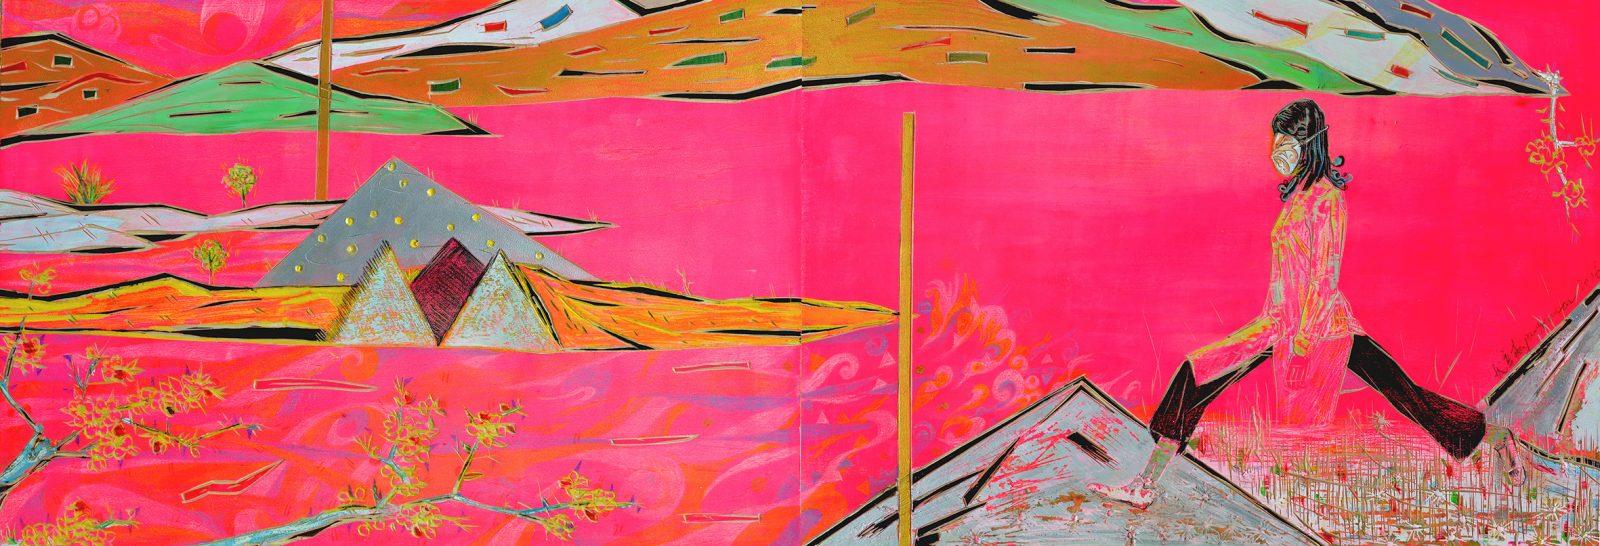 Pang Xinsen 庞辛森, 'Rosy landscape' 玫色山水 90 x 30 cm, 2016.jpg